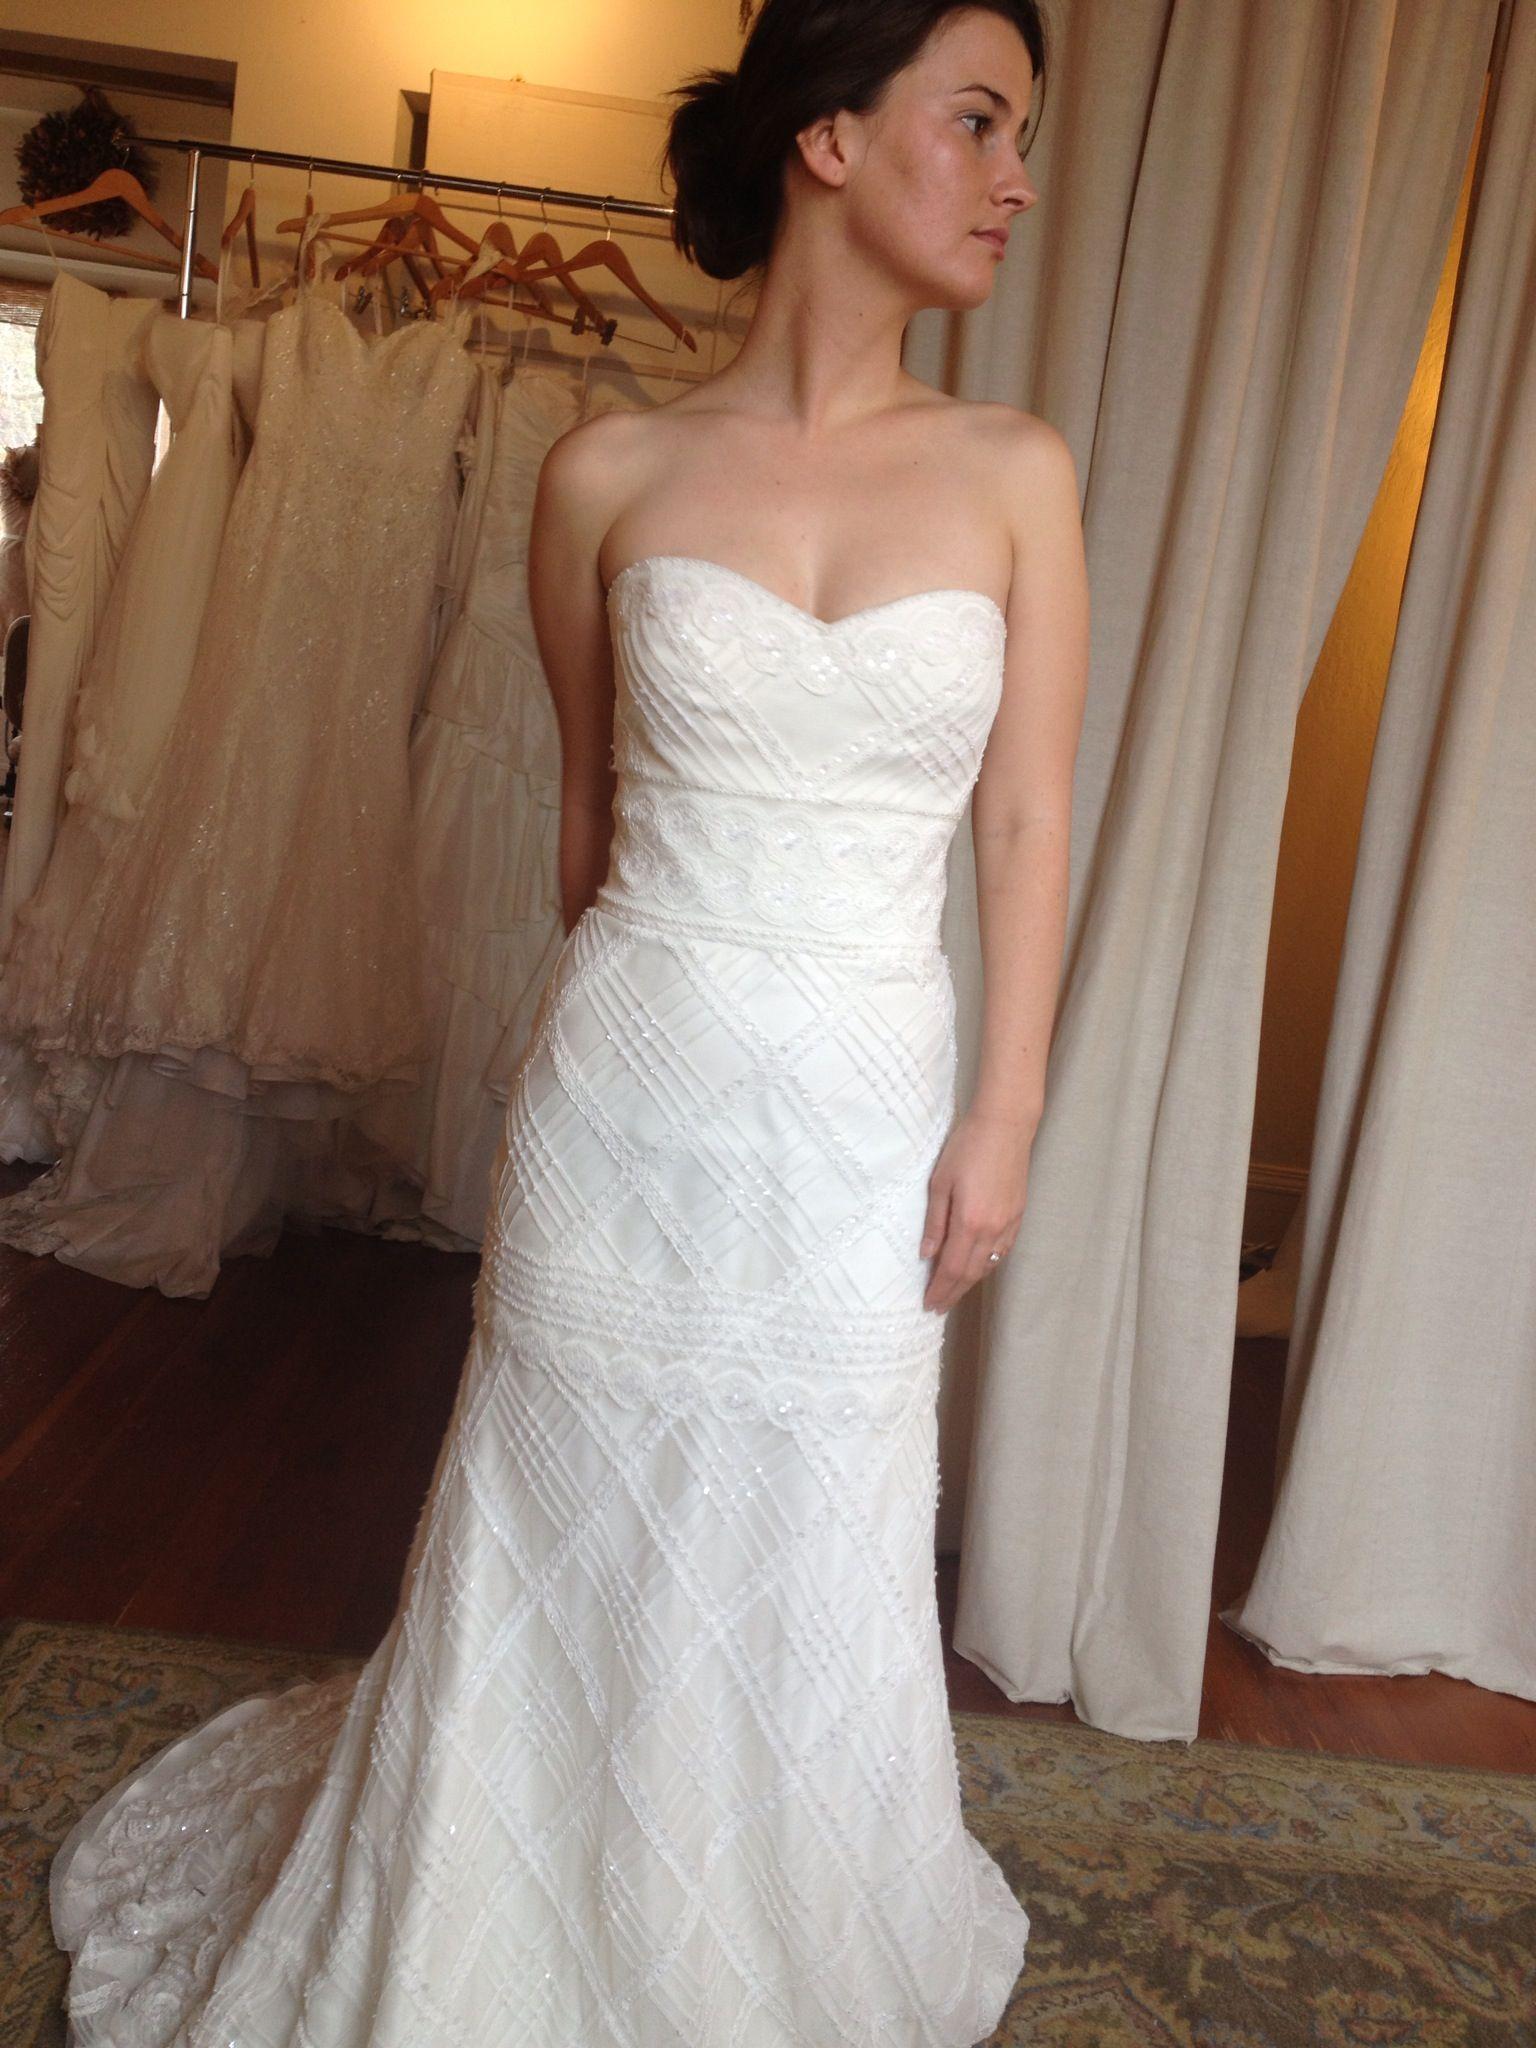 My wedding dress wedding reality pinterest wedding dress and